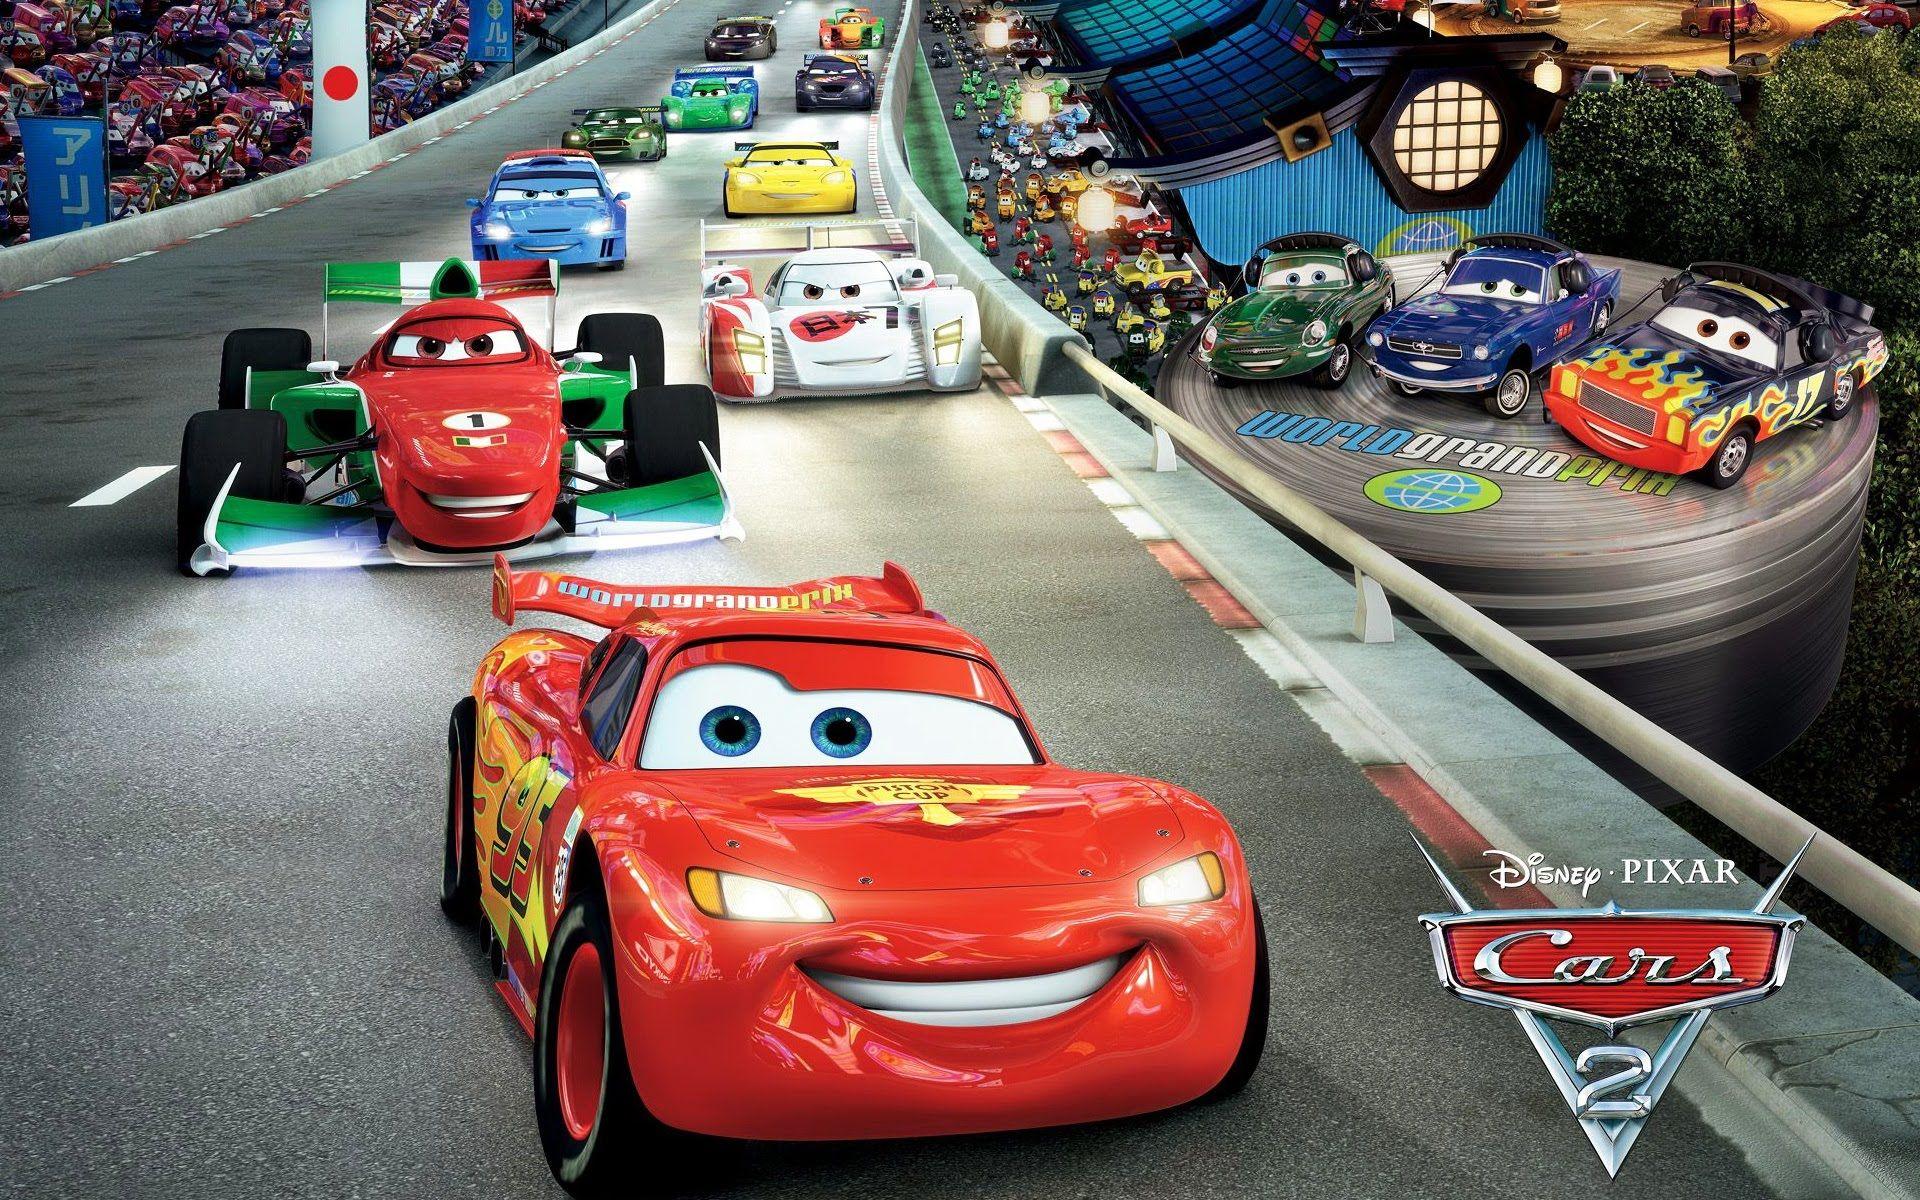 Cars silver racer poster 2 - Cars 2 Game Battle Race Lightning Mcqueen Cars 2 Game Full Movie